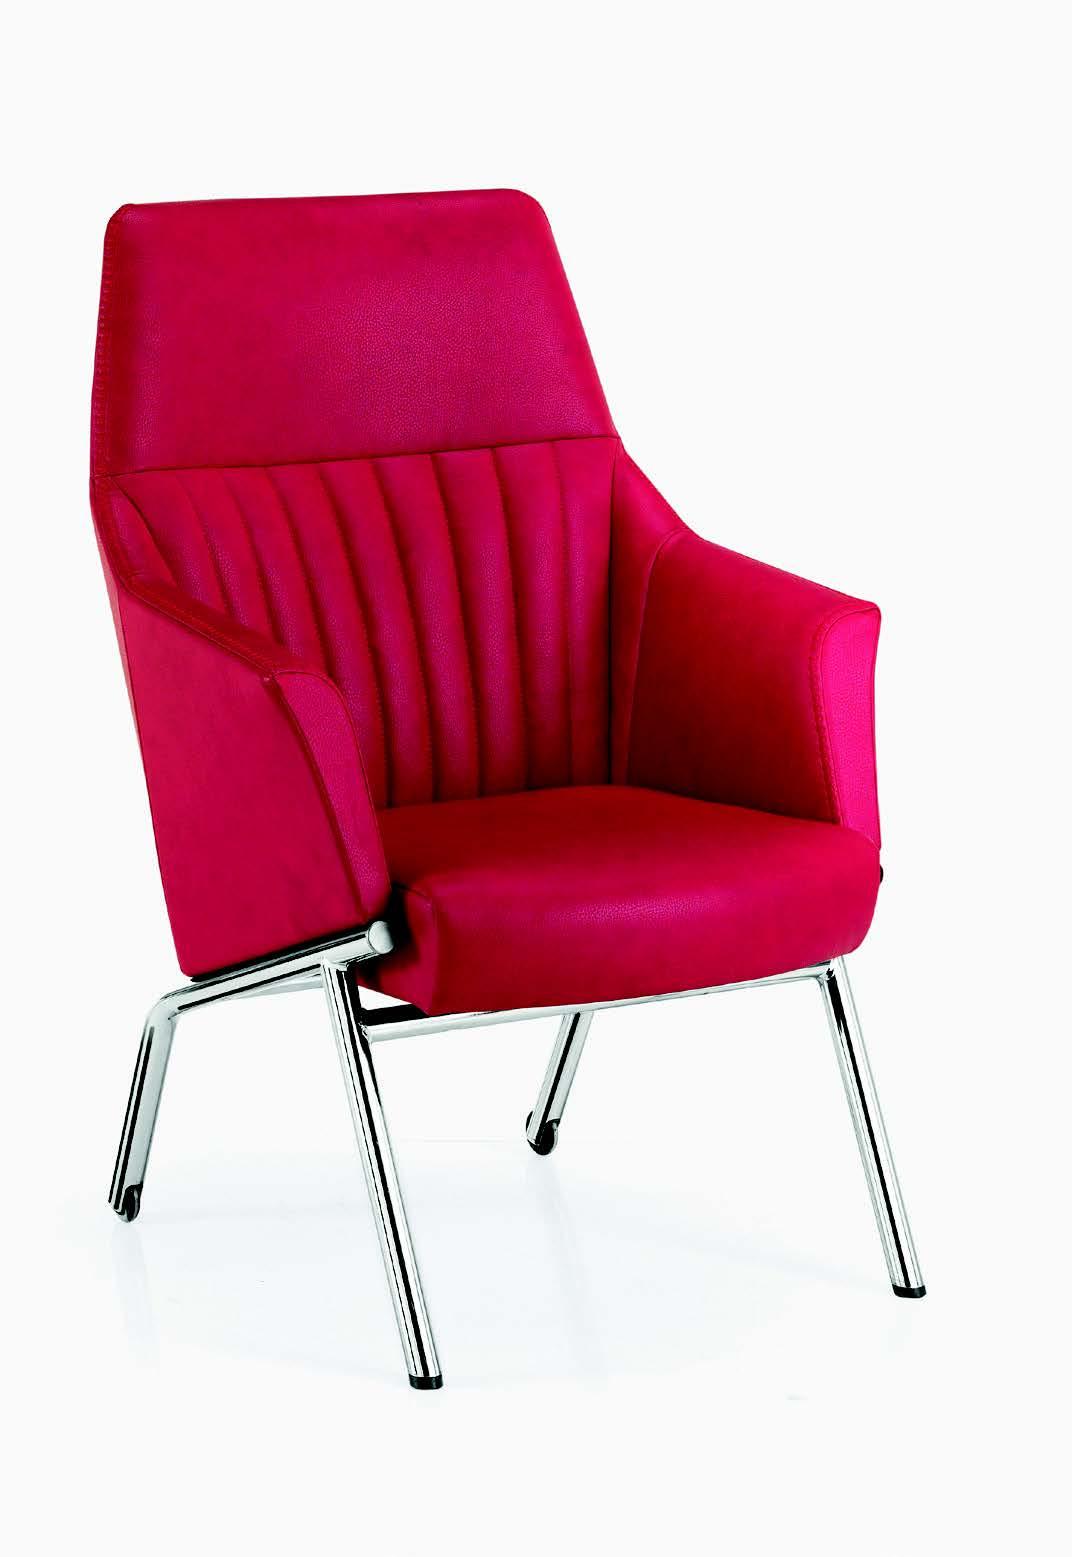 Poltrona ospiti strip alta galimberti sedie e tavoli for Galimberti sedie